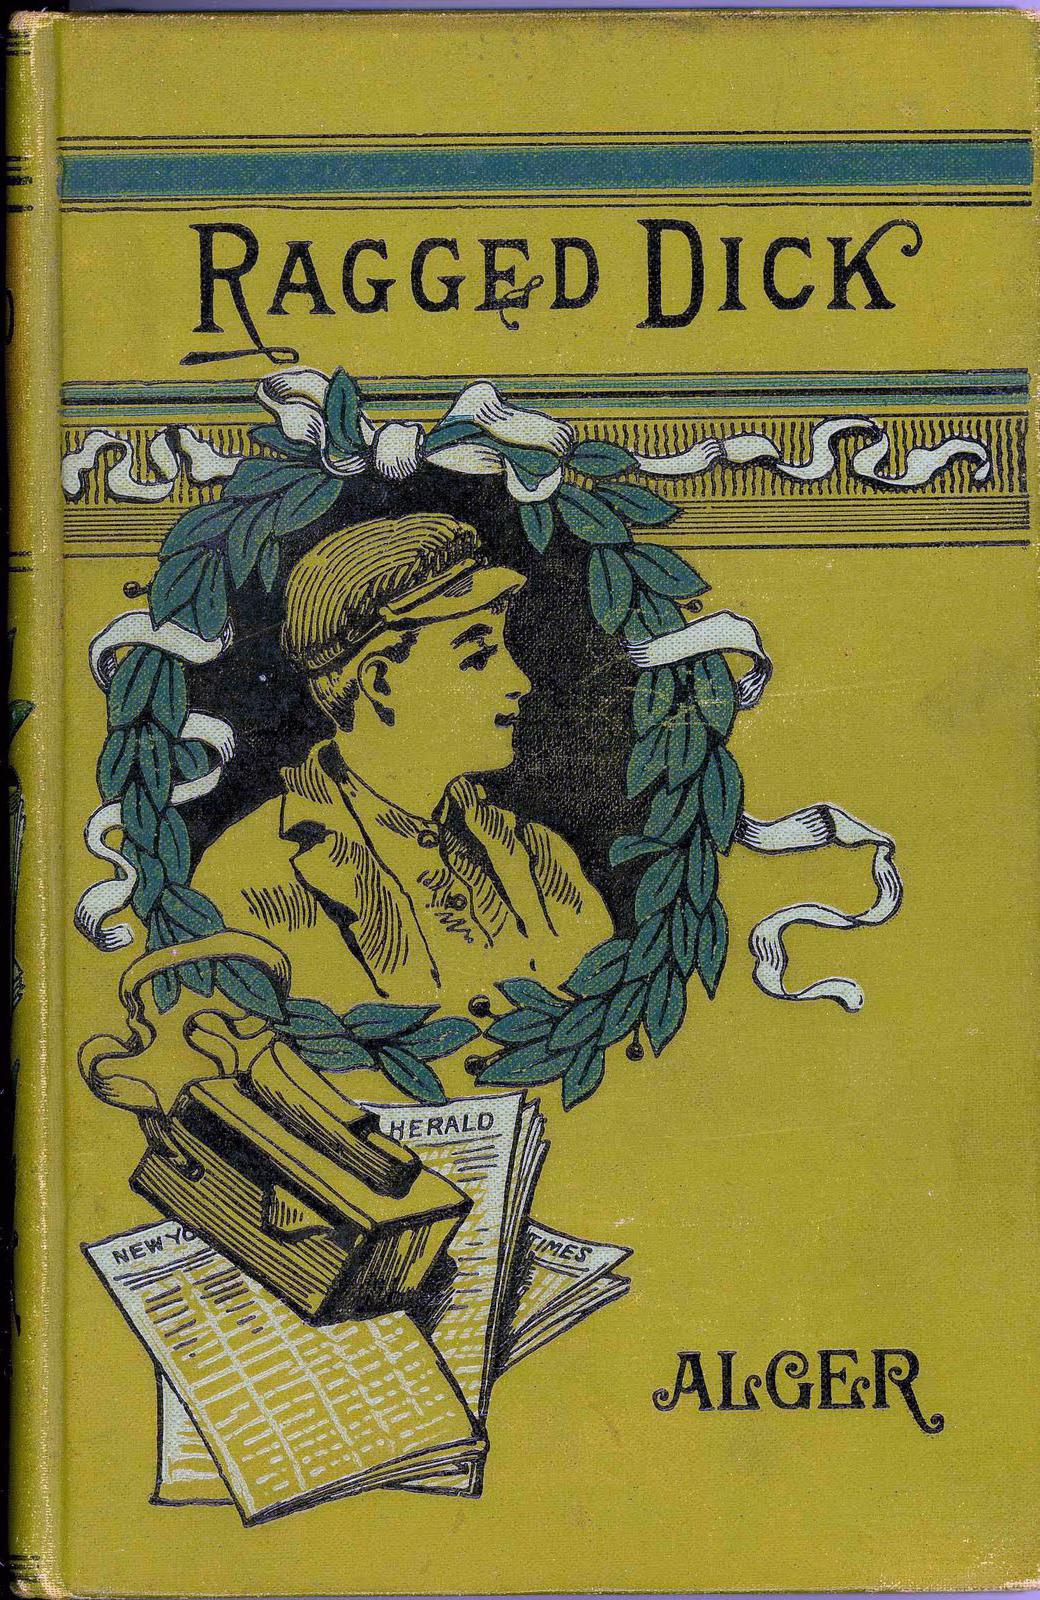 Ragged dicks kalamazoo public library